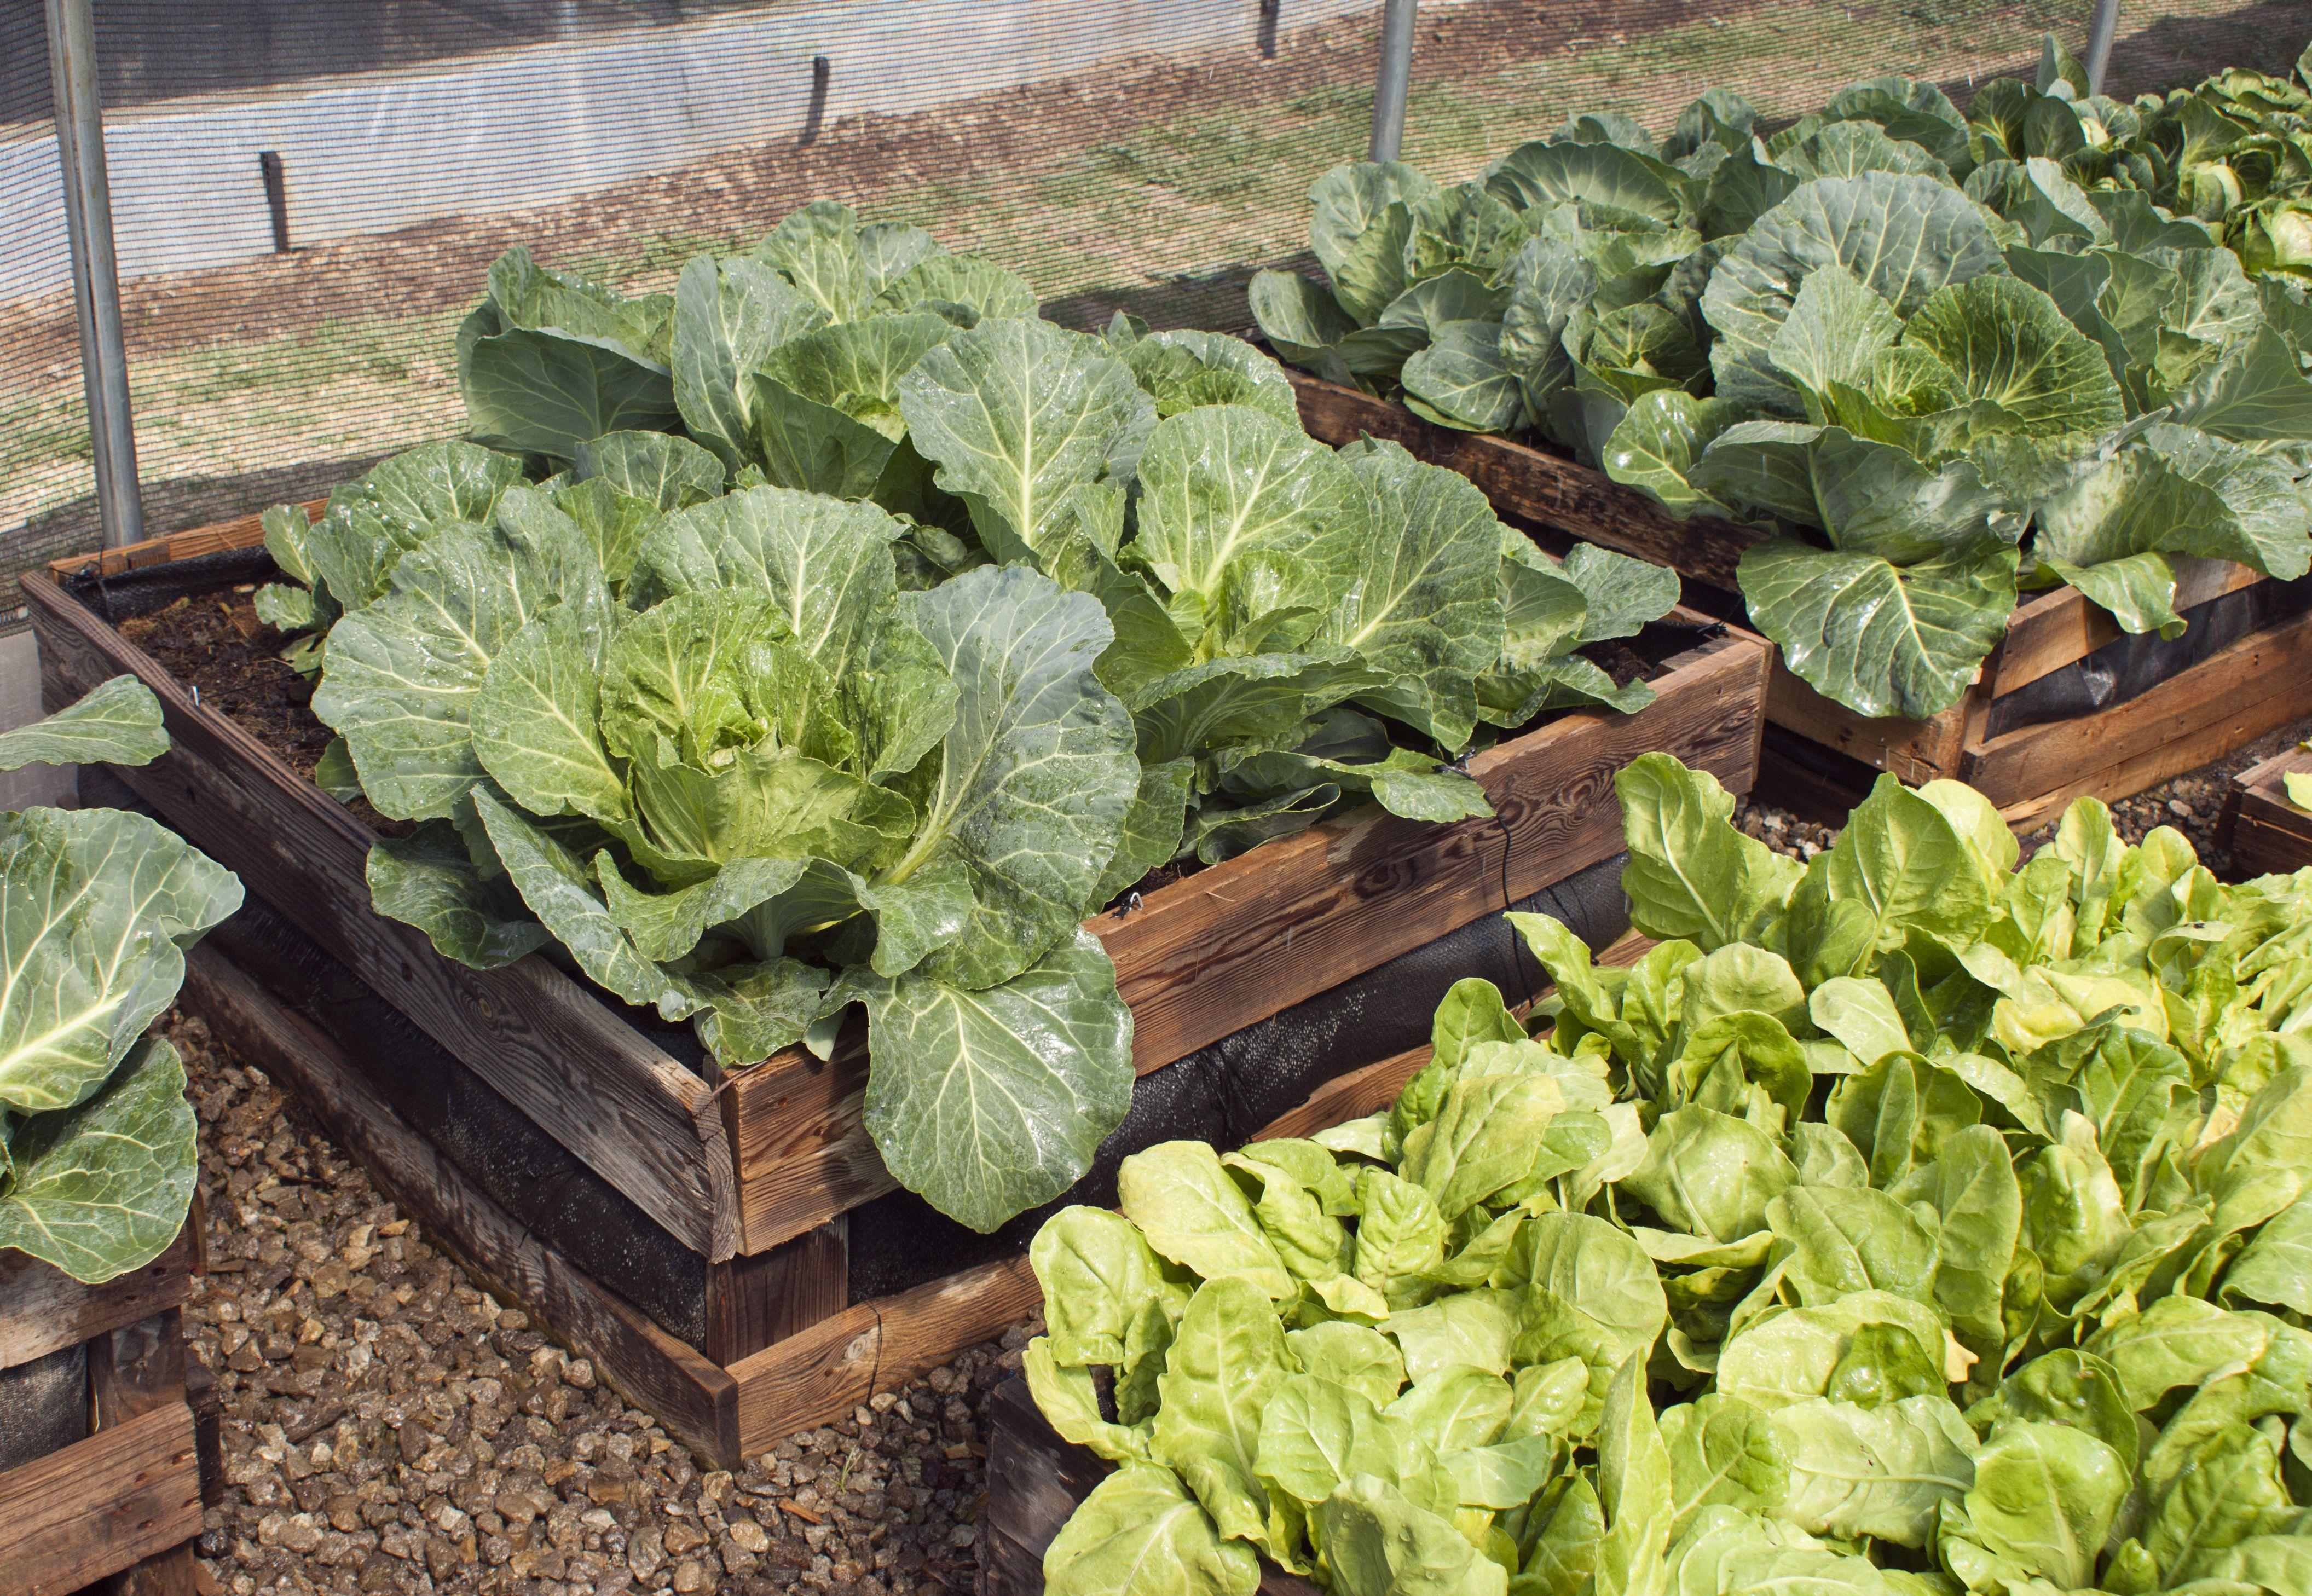 5 Inspiring Examples of Zero Waste Gardening